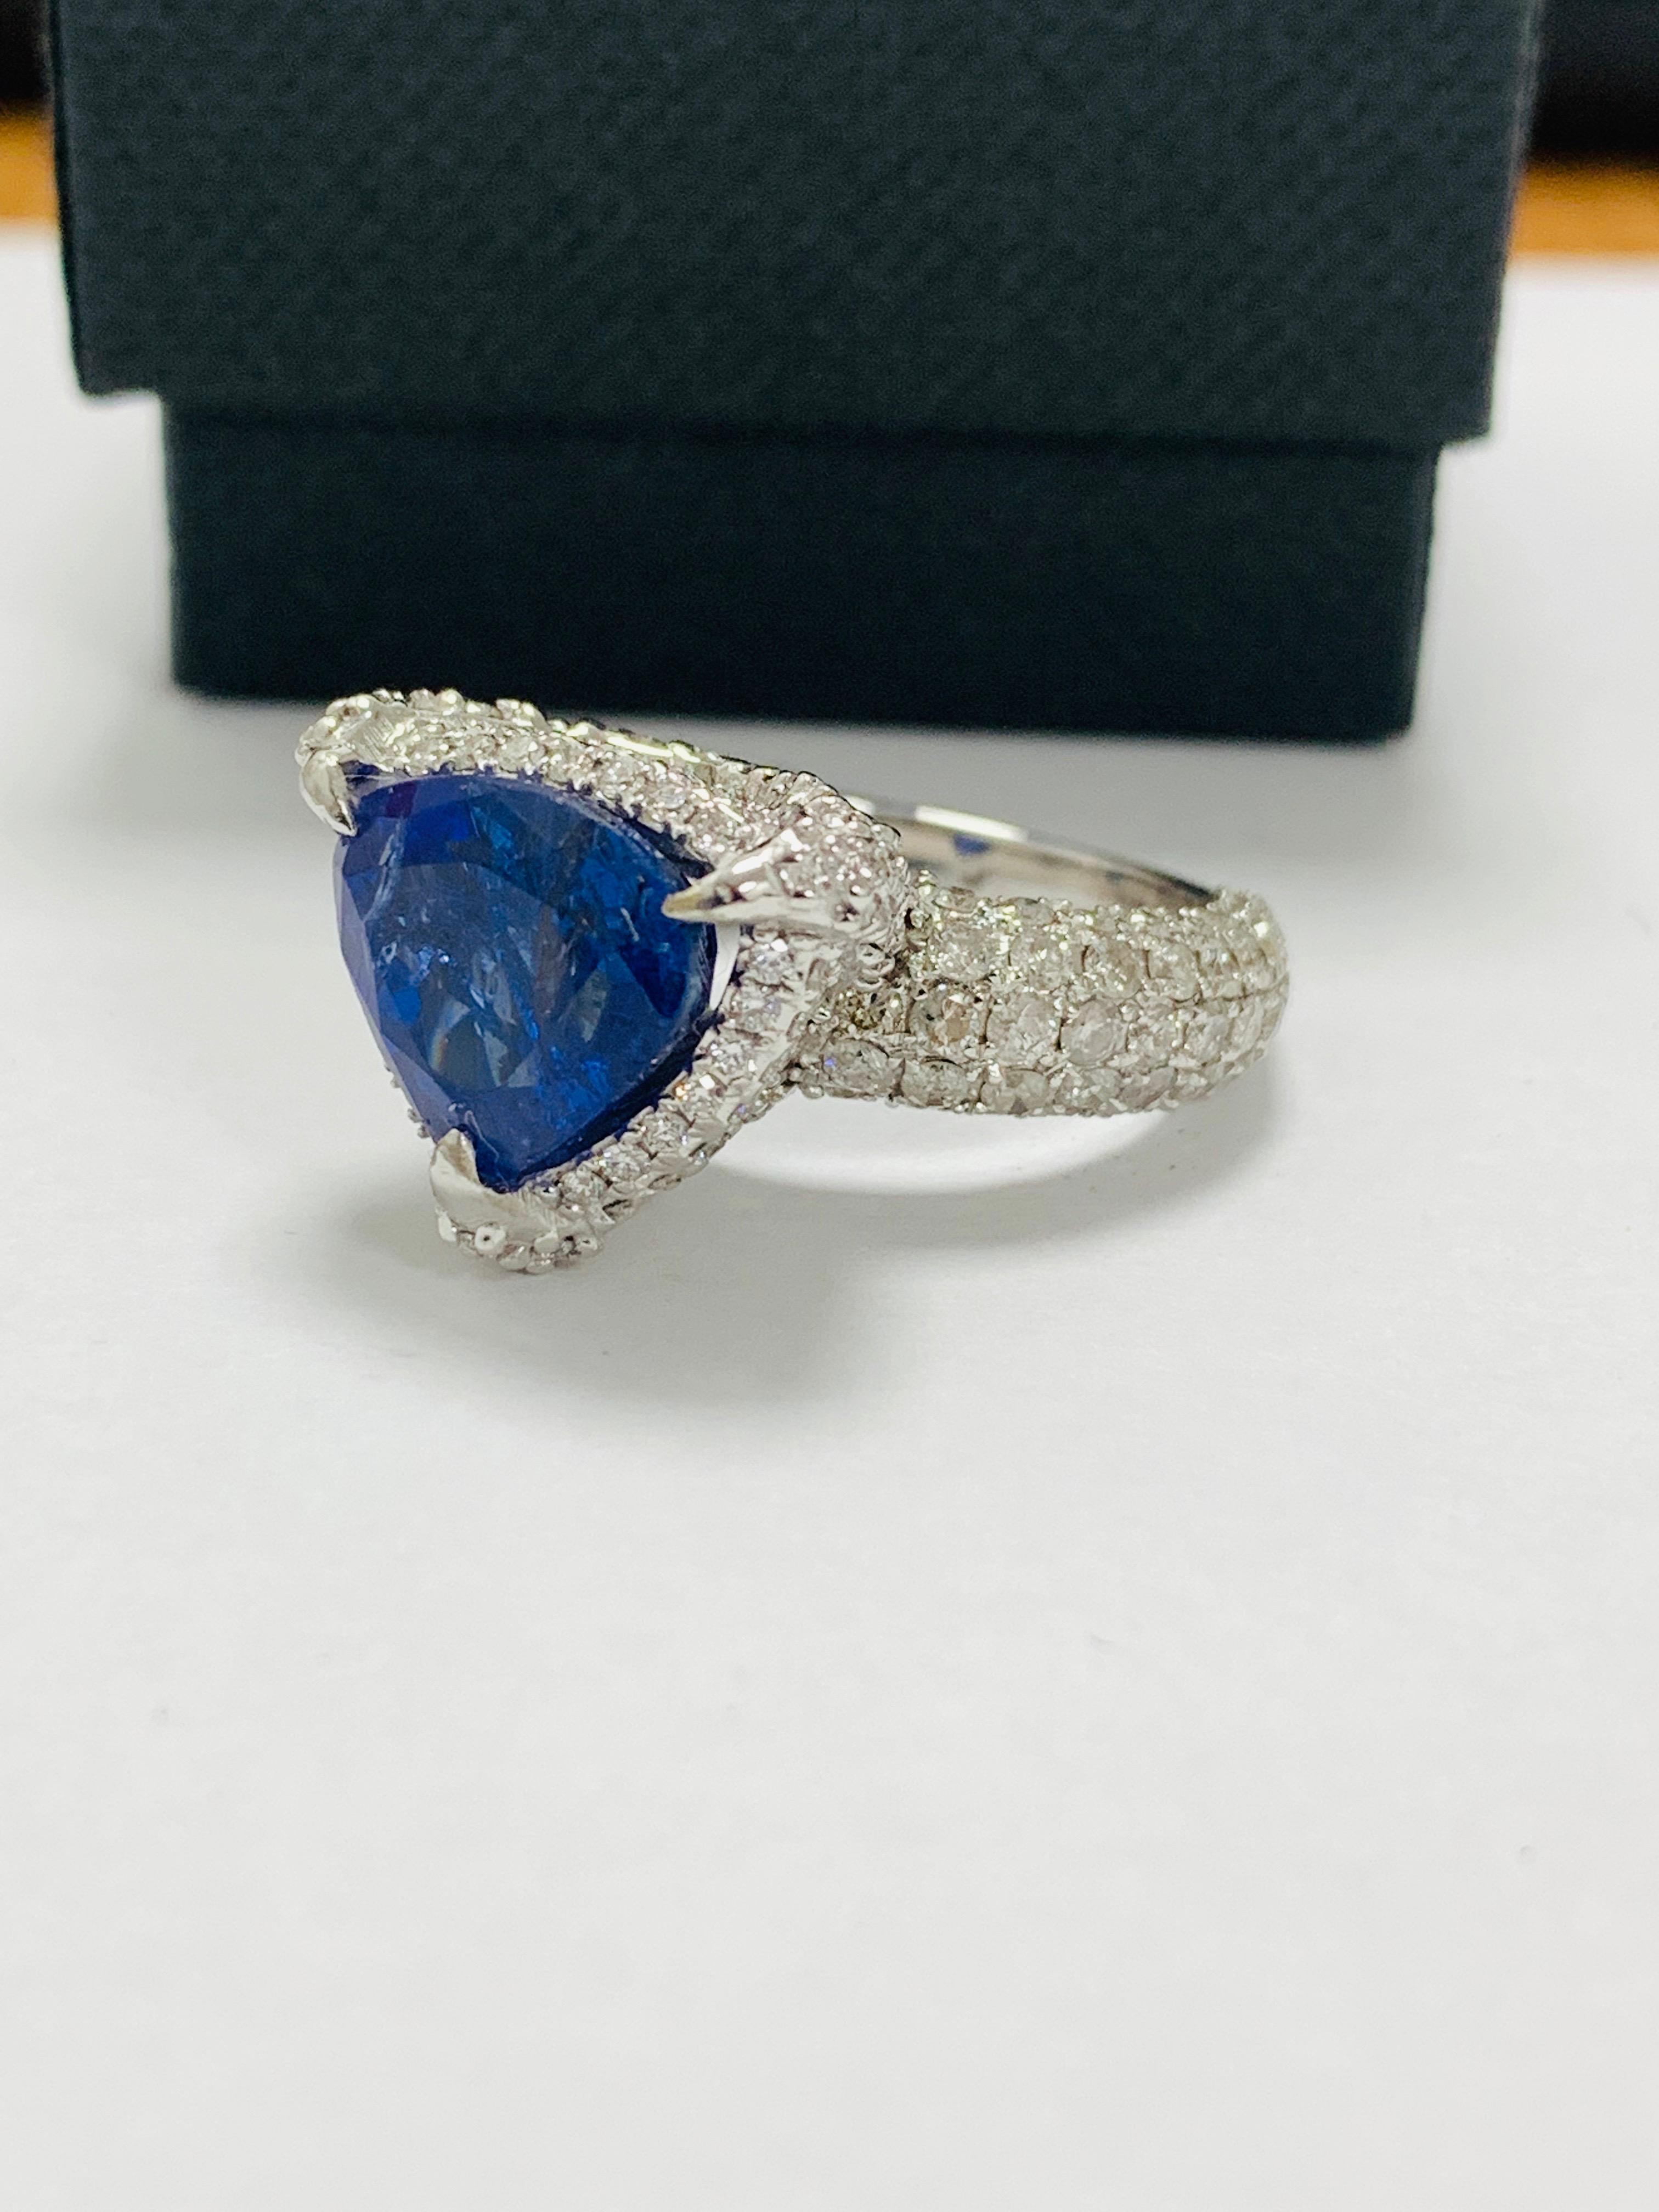 platinum tanzanite ring - Image 2 of 13